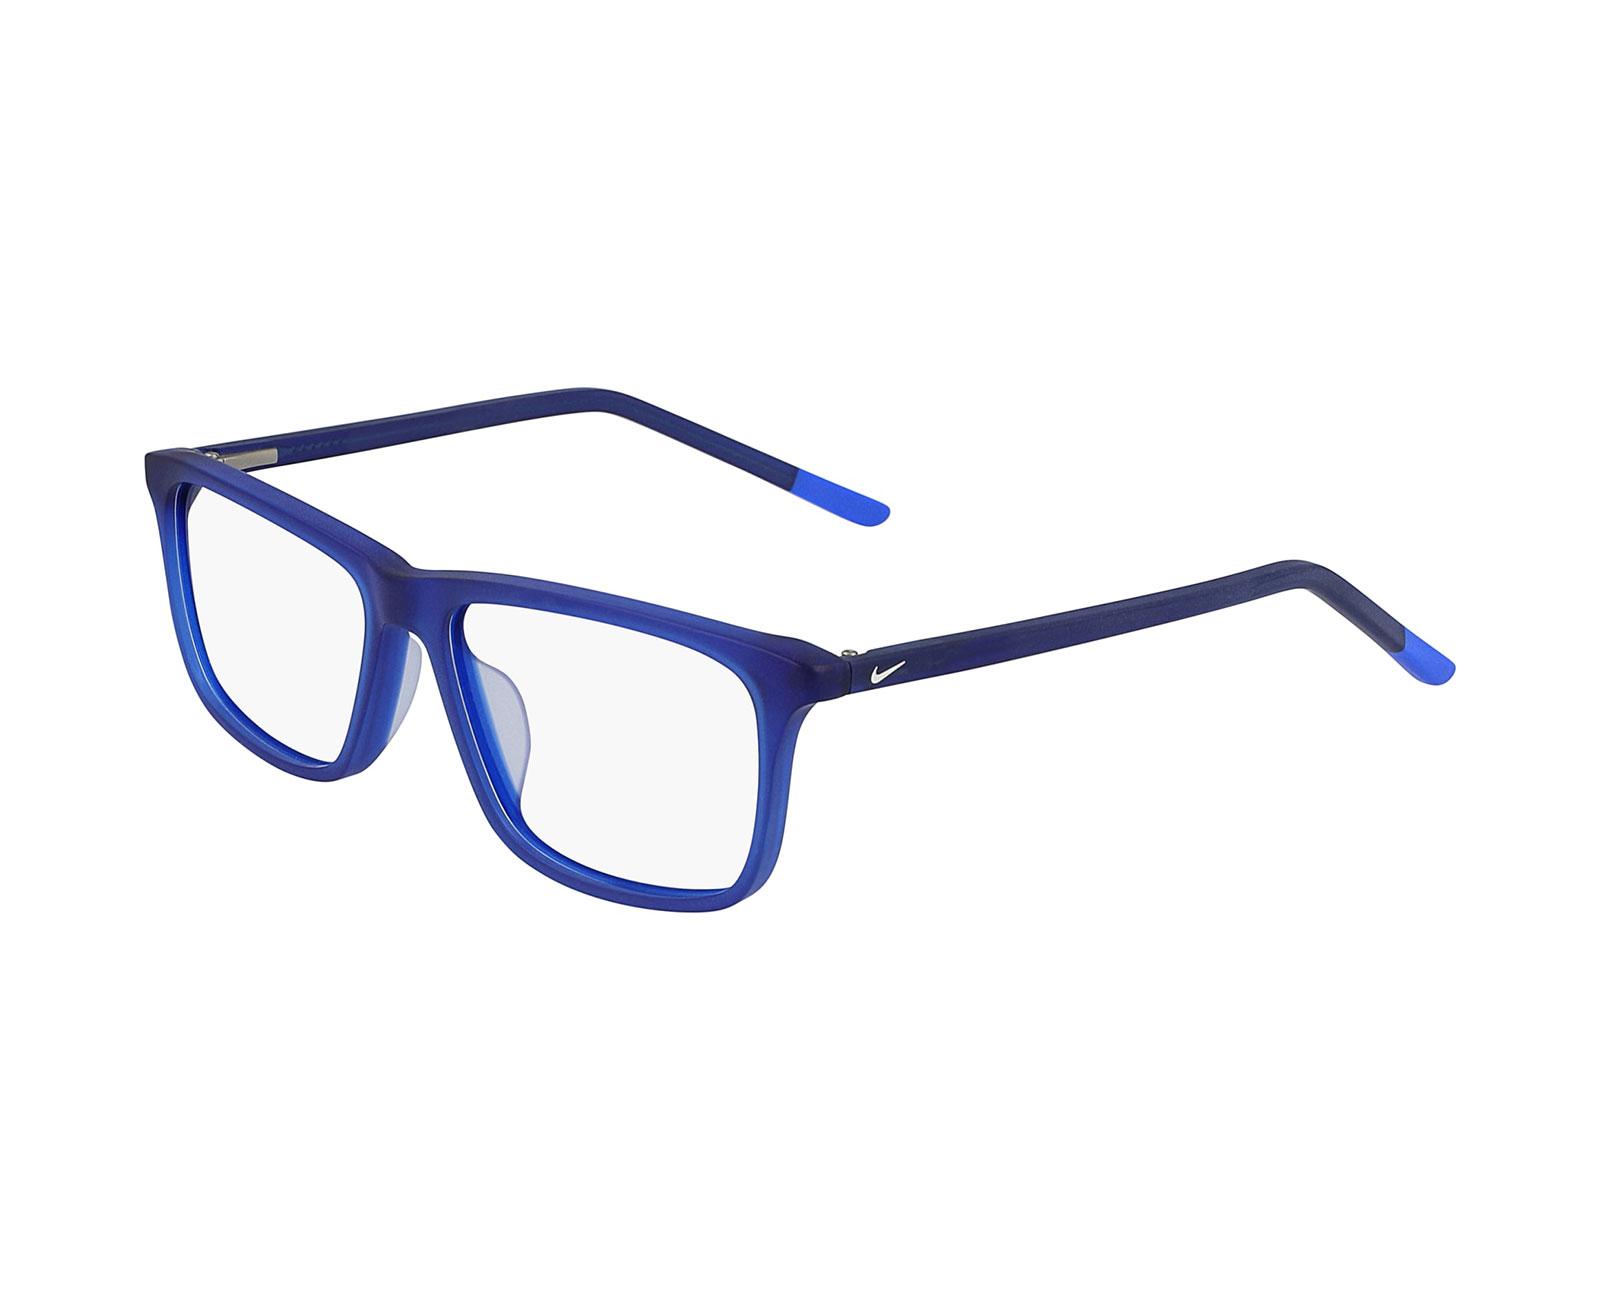 Nike 5541 in Matte Deep Royal Blue/Blue